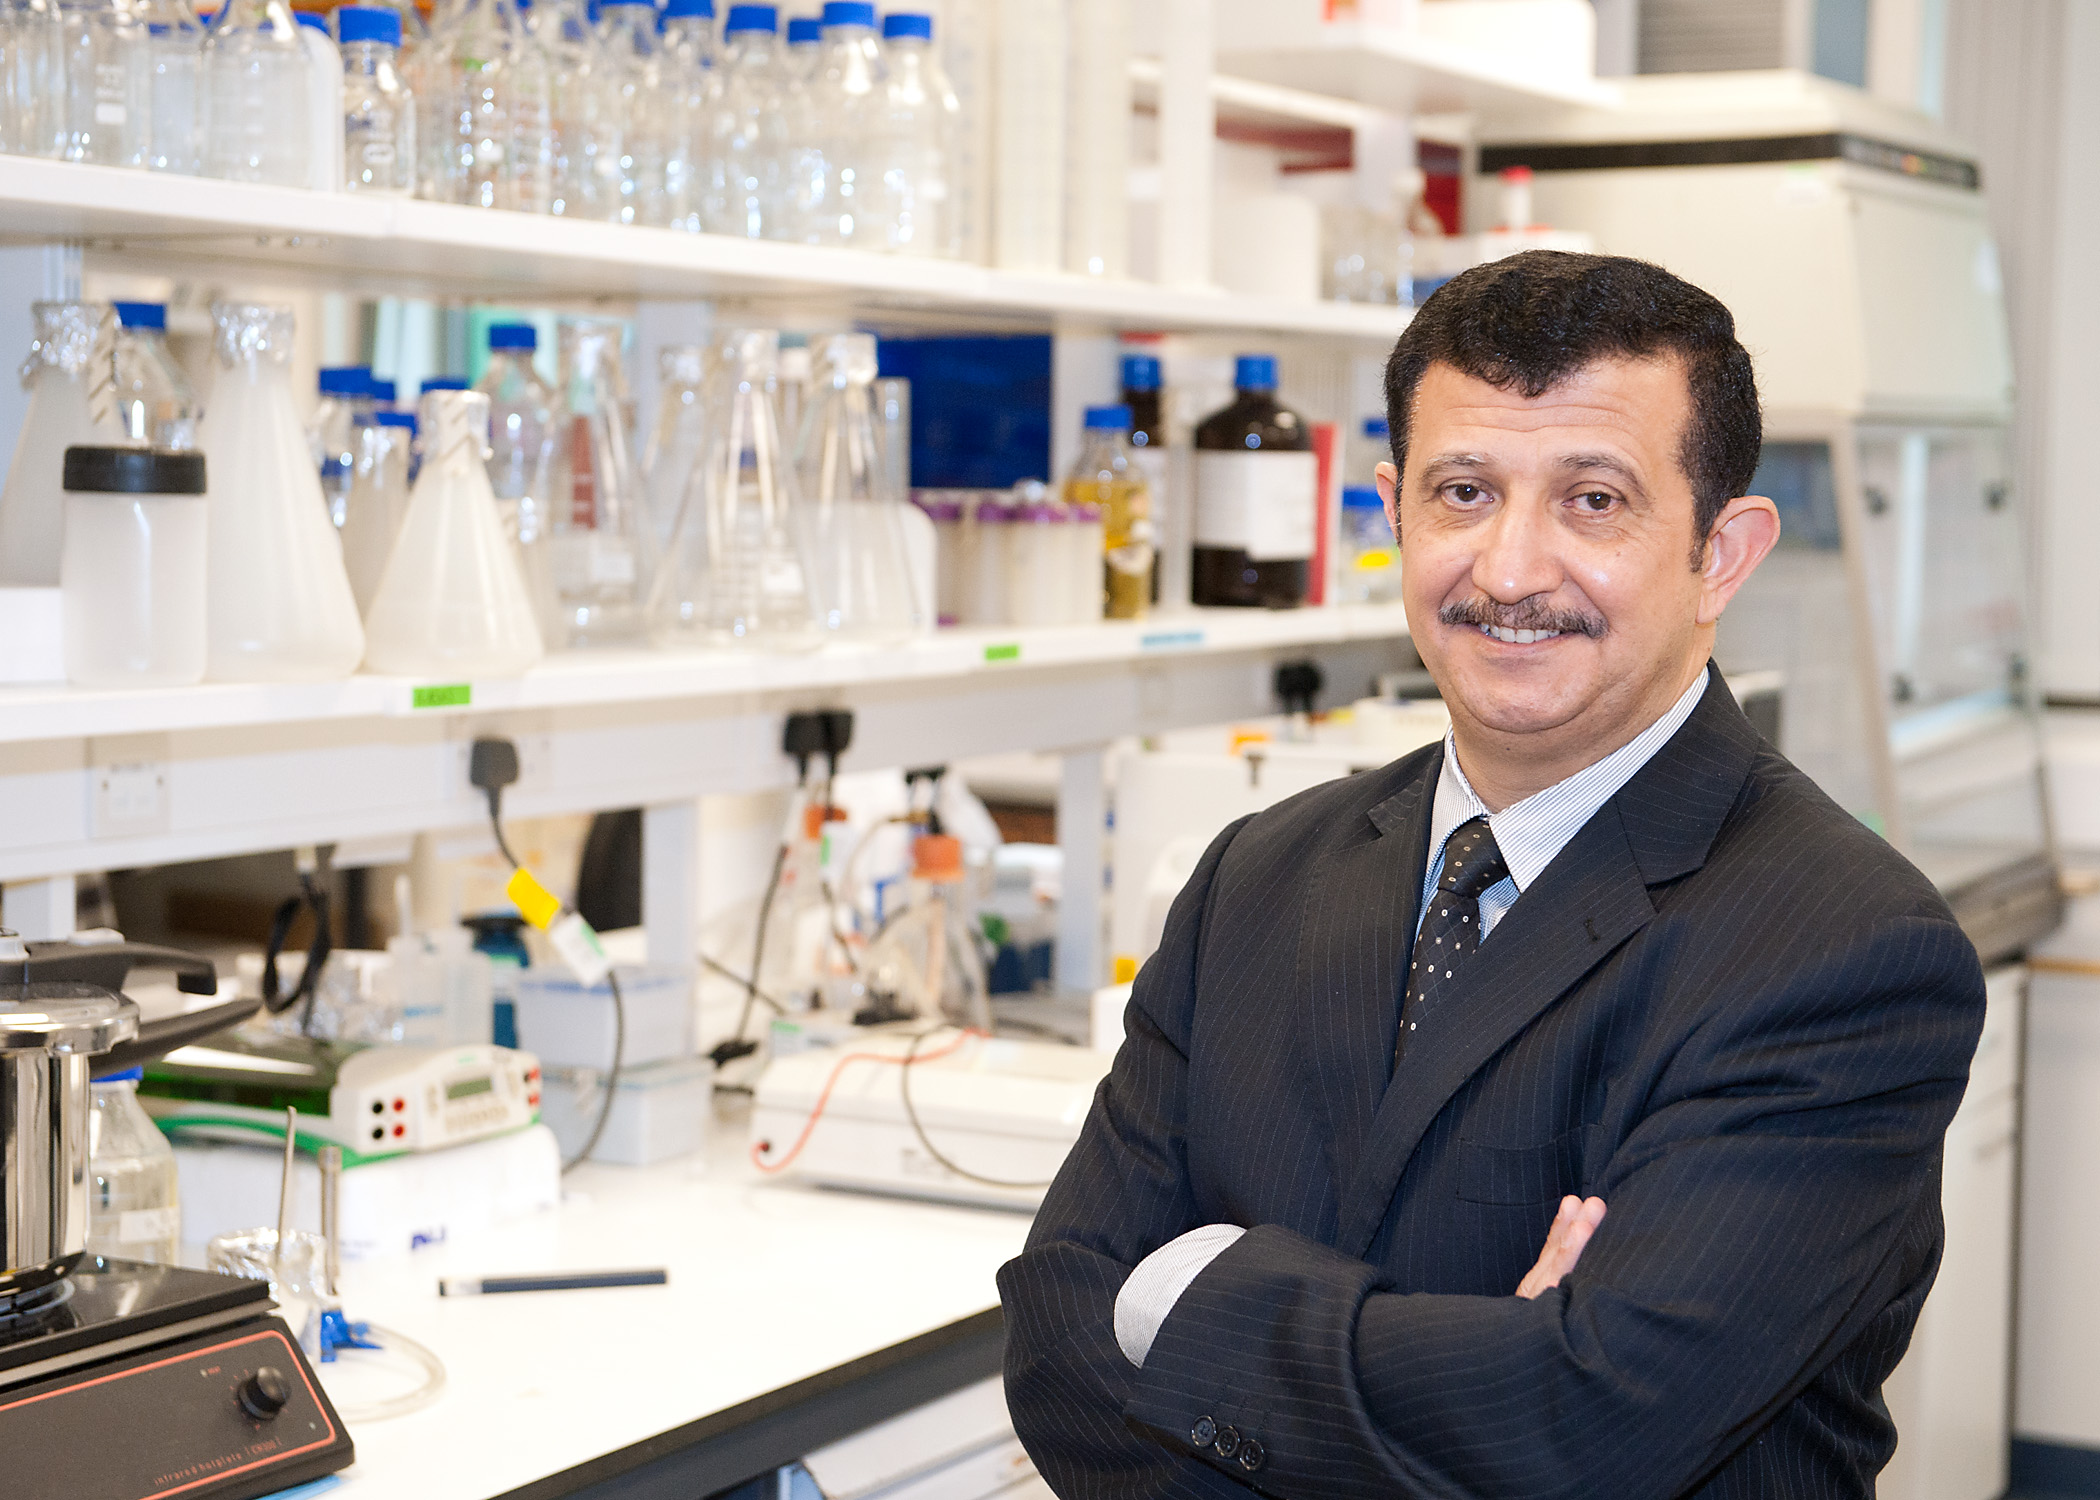 Mohamed El-Tanani, University of Bradford